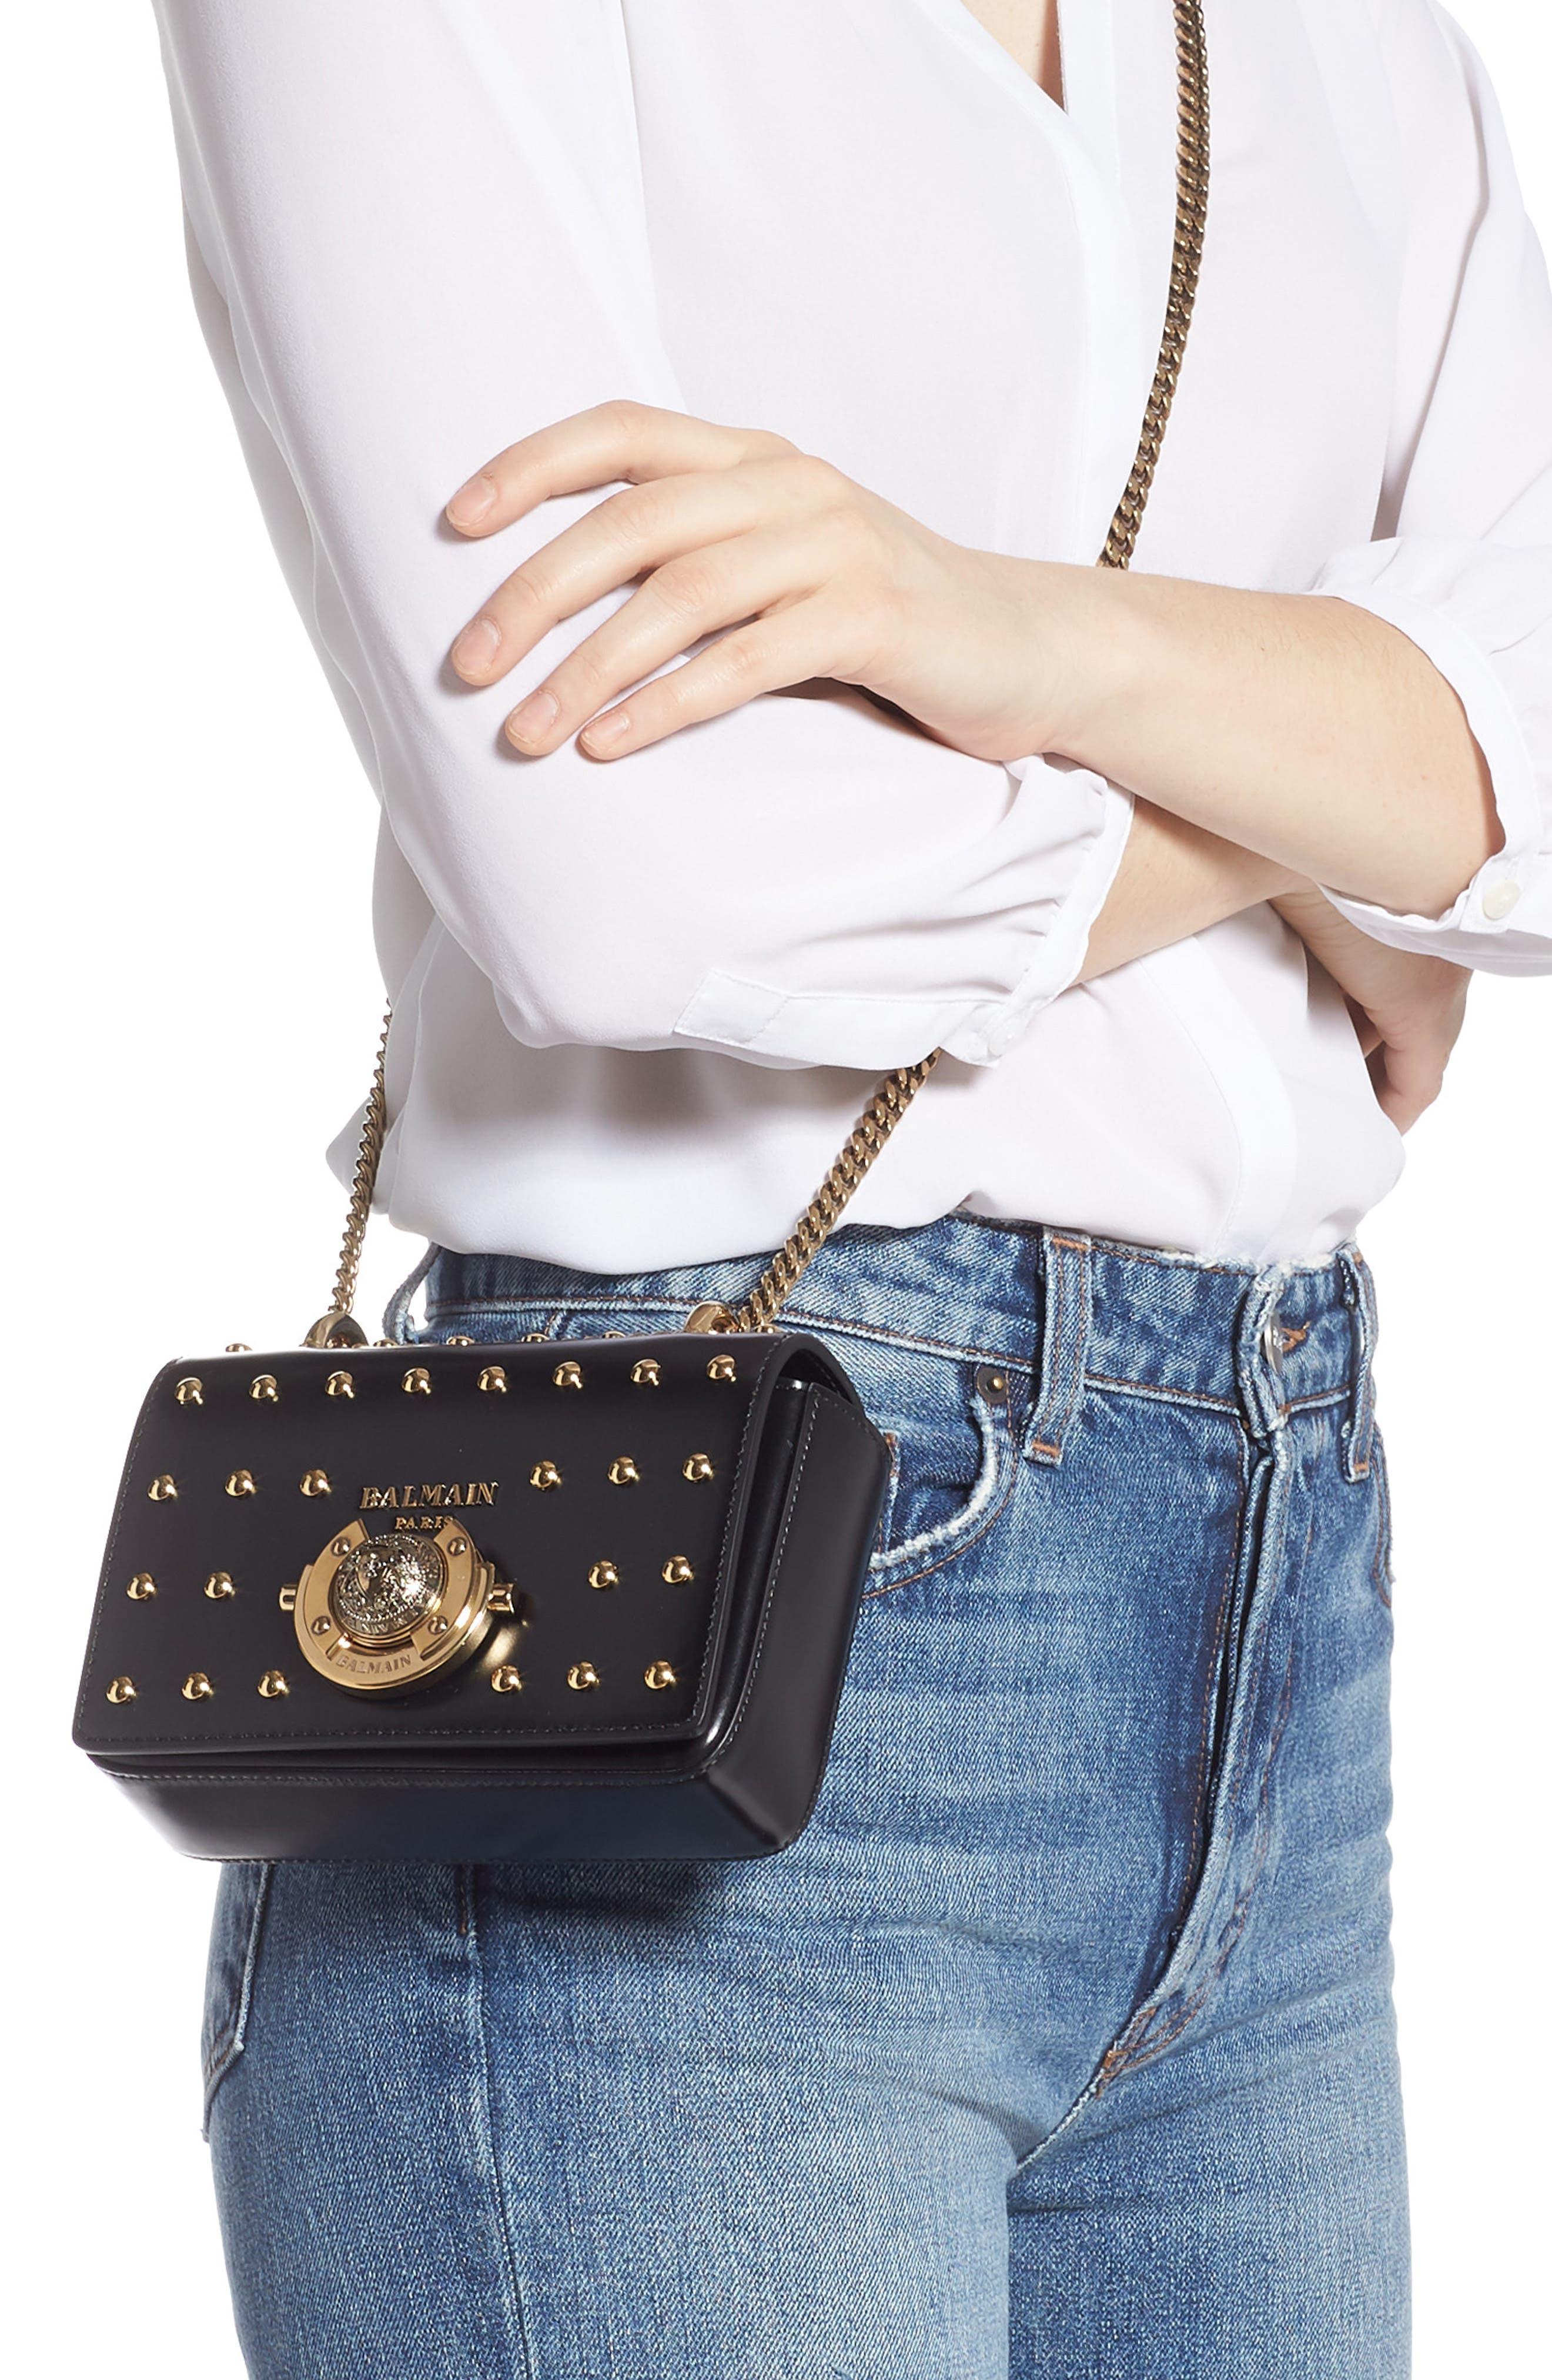 29bff70b0d Women s Designer Handbags   Wallets